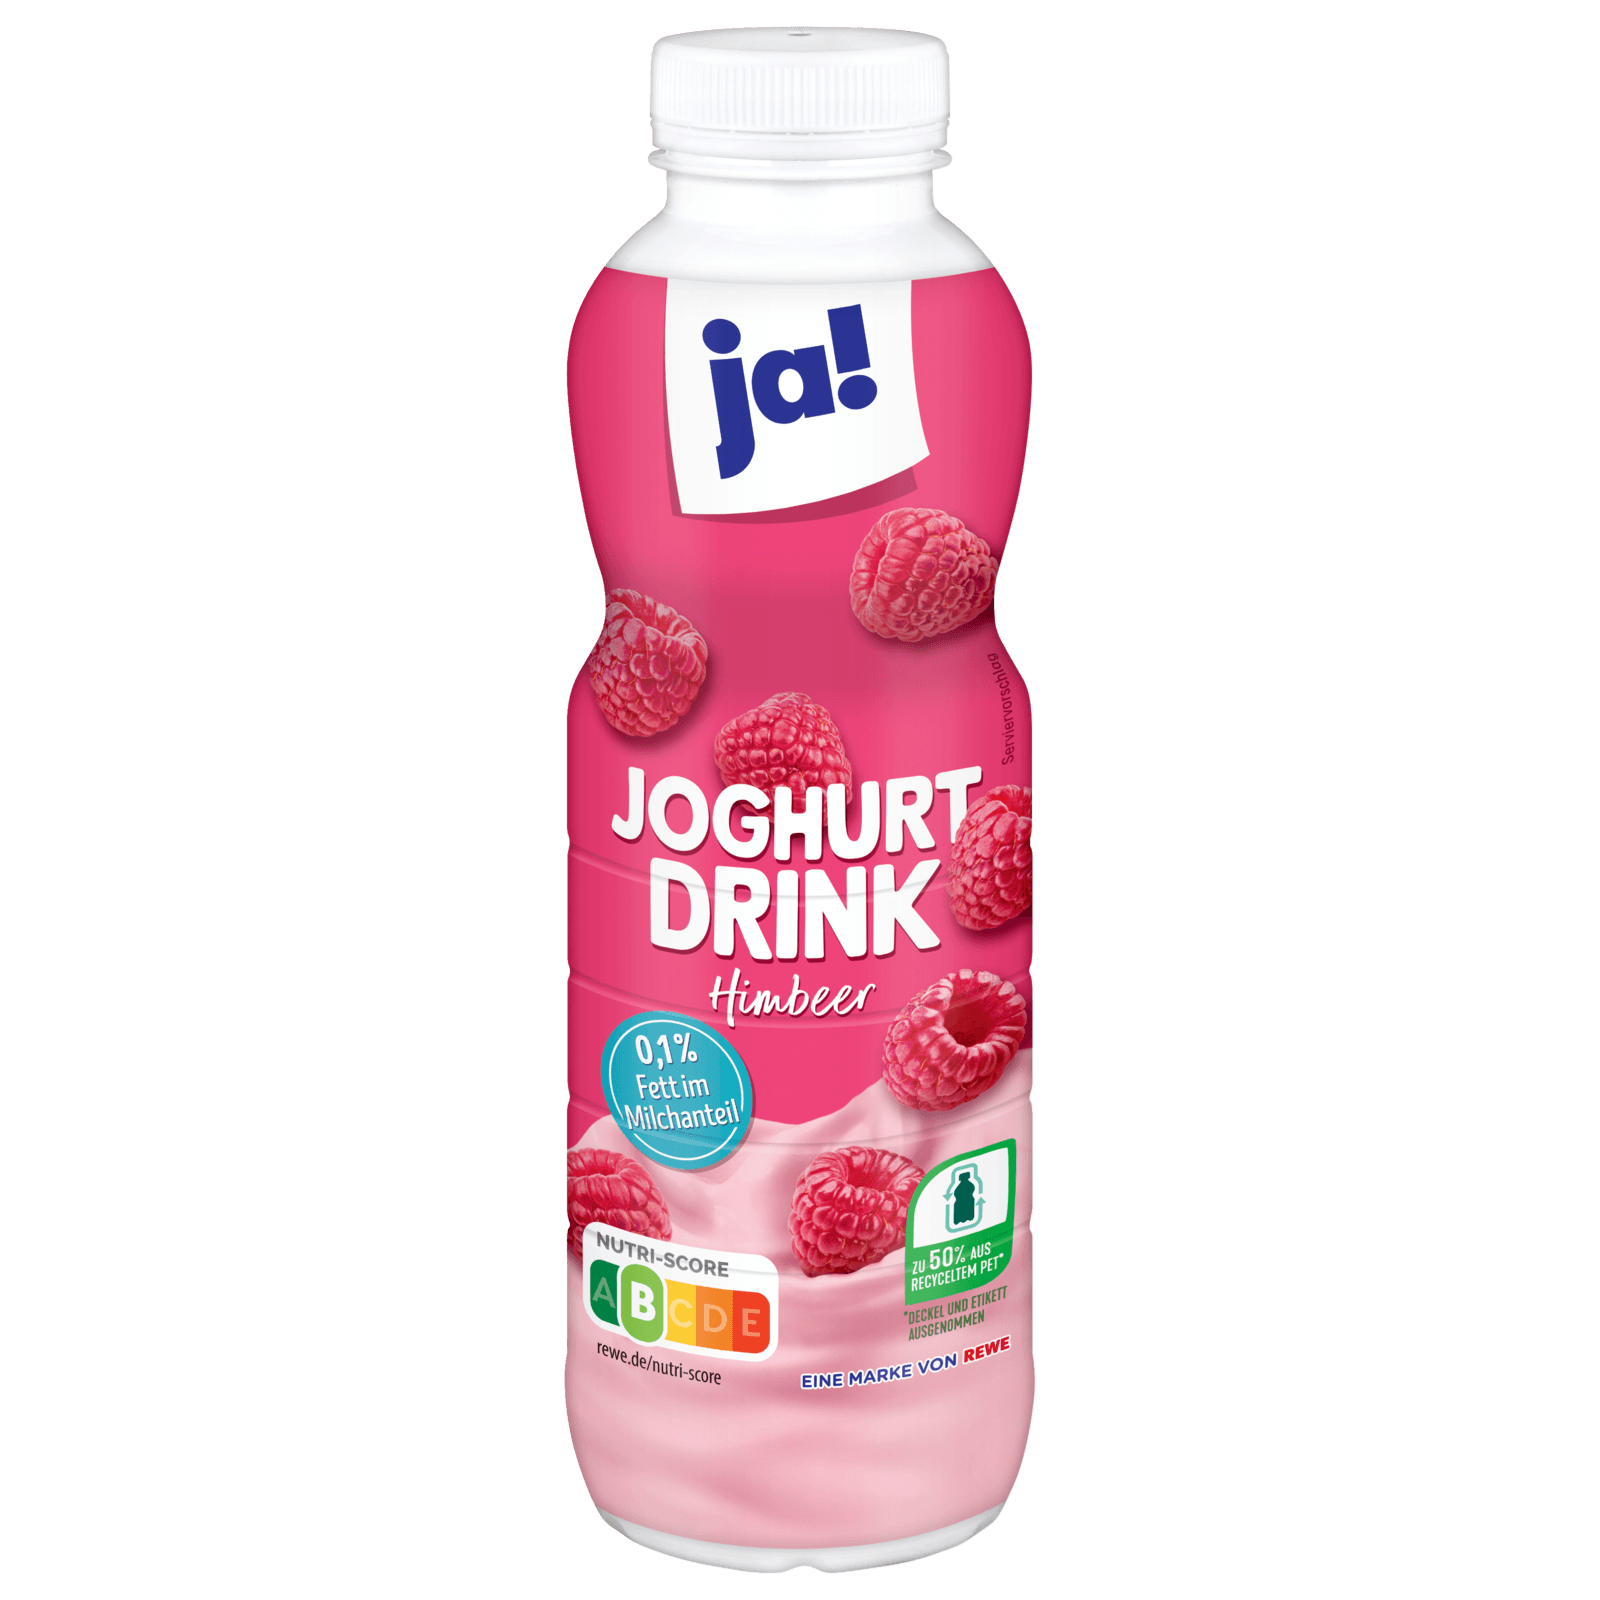 ja! Joghurt- Drink Himbeere 0,1% 500g